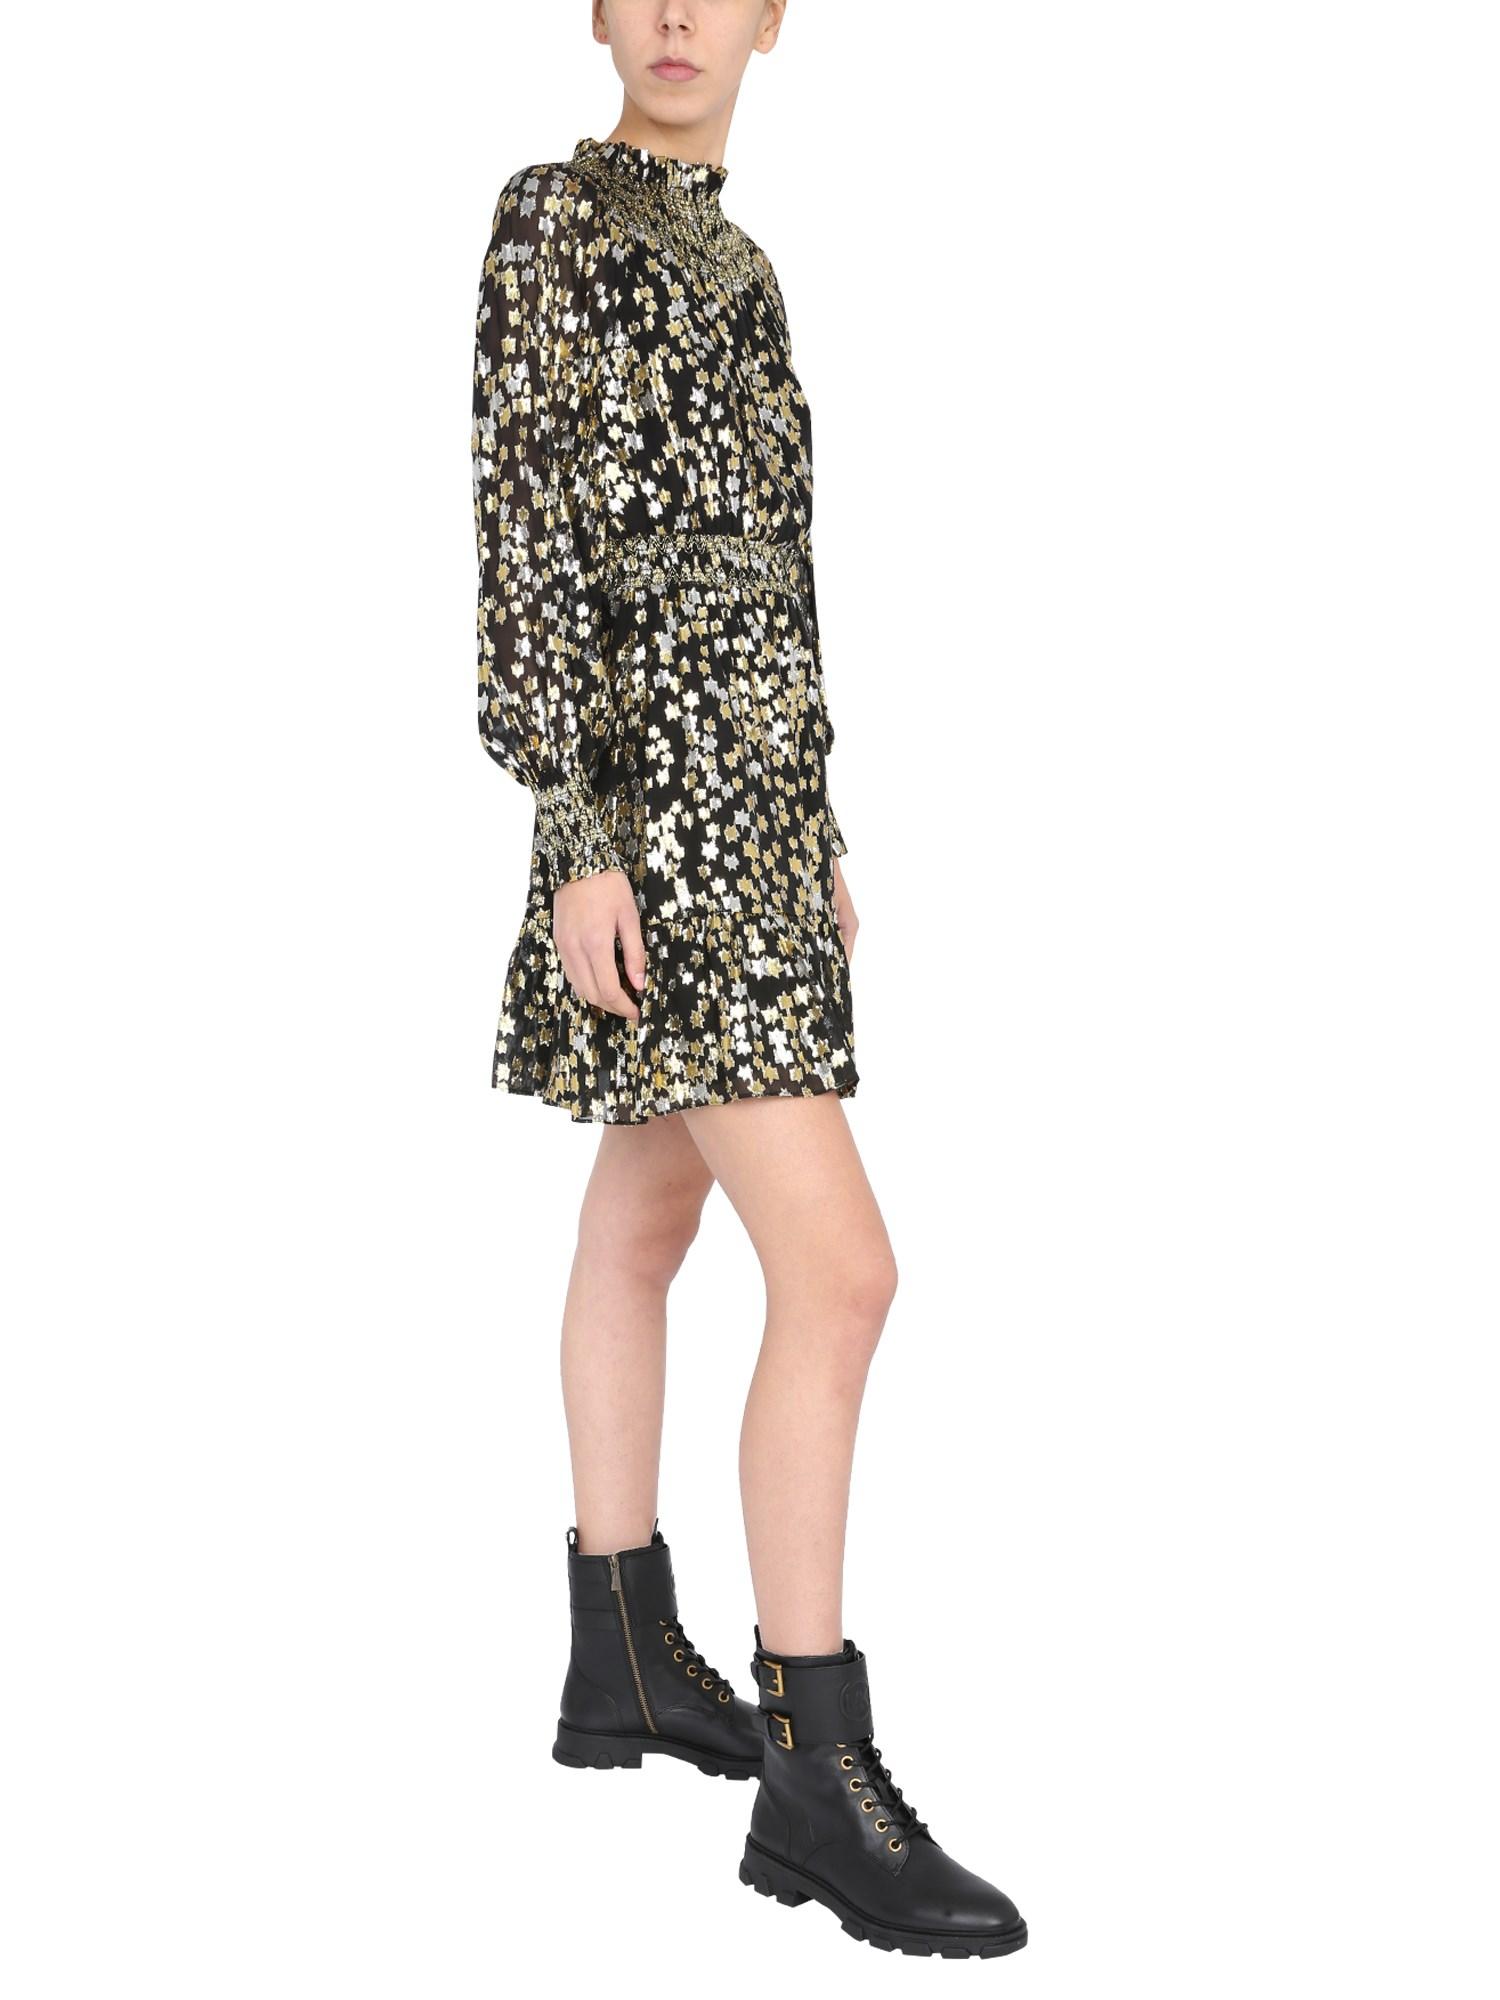 Mini dress with star pattern - michael by michael kors - Modalova